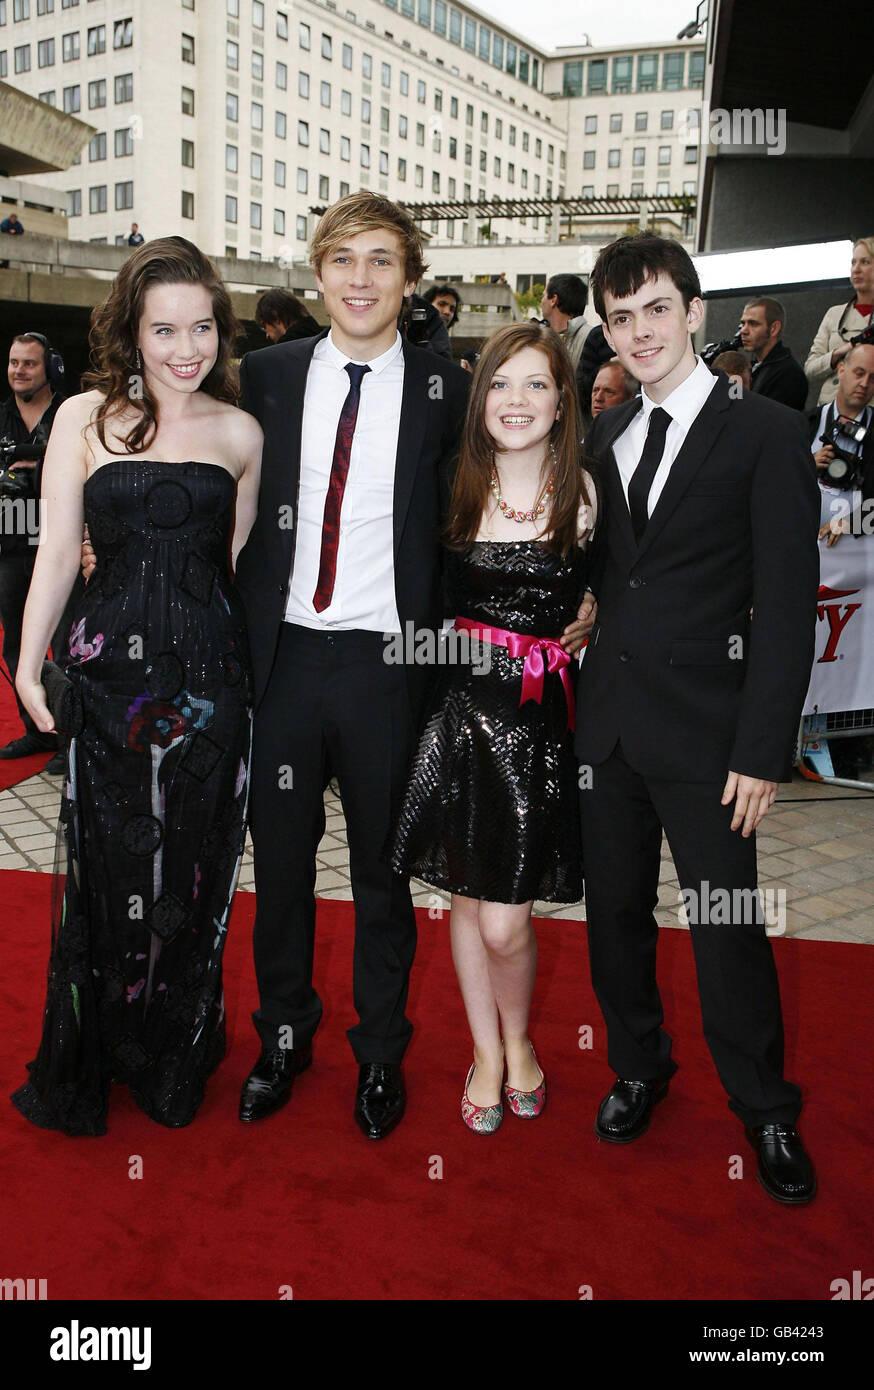 National Movie Awards 2008 London Stockfoto Bild 110112915 Alamy